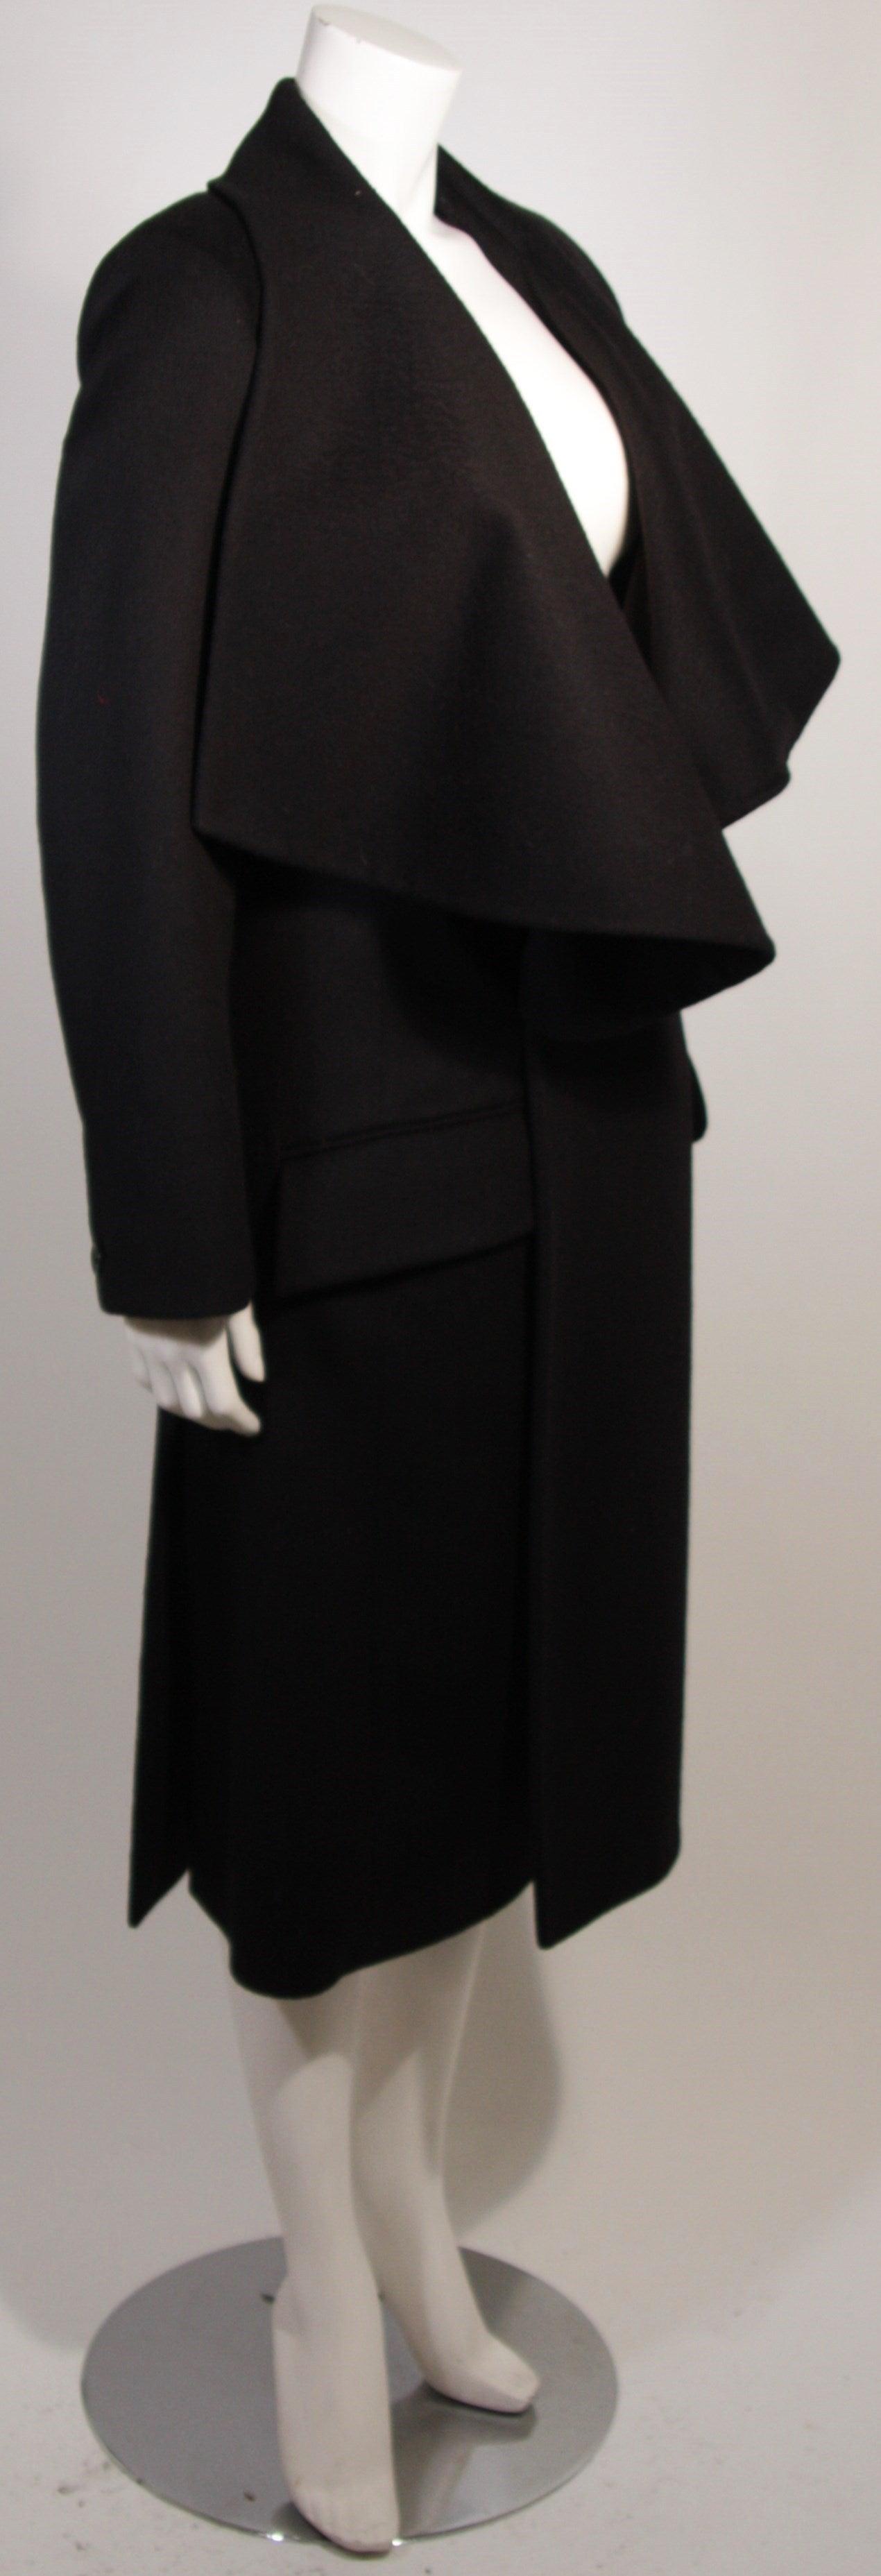 John Galliano Over-Sized Asymmetrical Collar Coat Size 10 42 For Sale 2